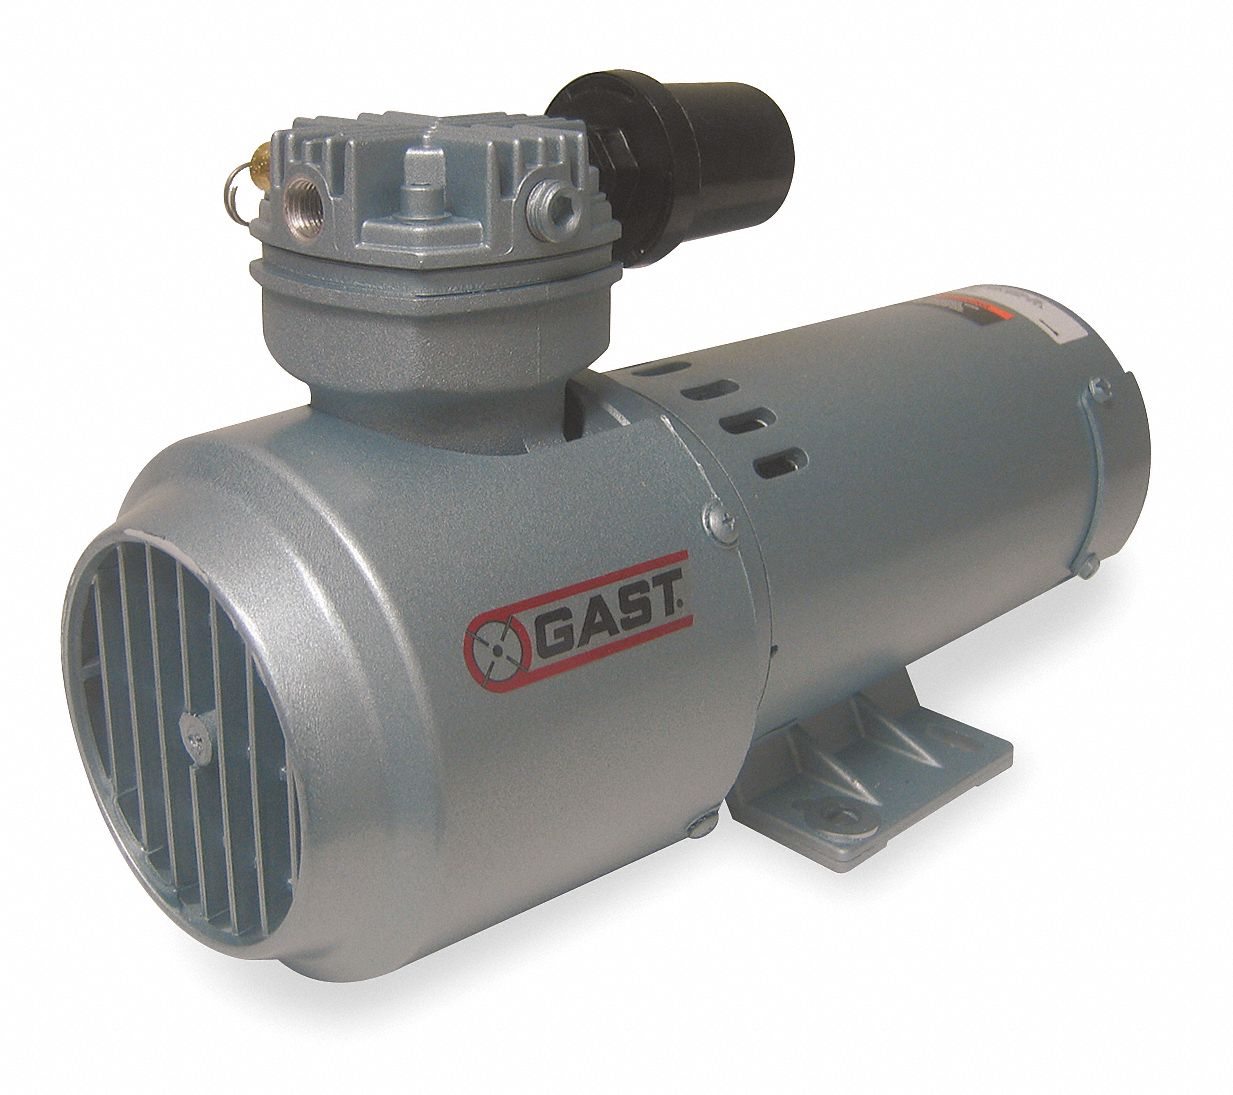 Gast 1 3 hp piston air compressor 12vdc 100 100 max psi for Gast air motor distributors